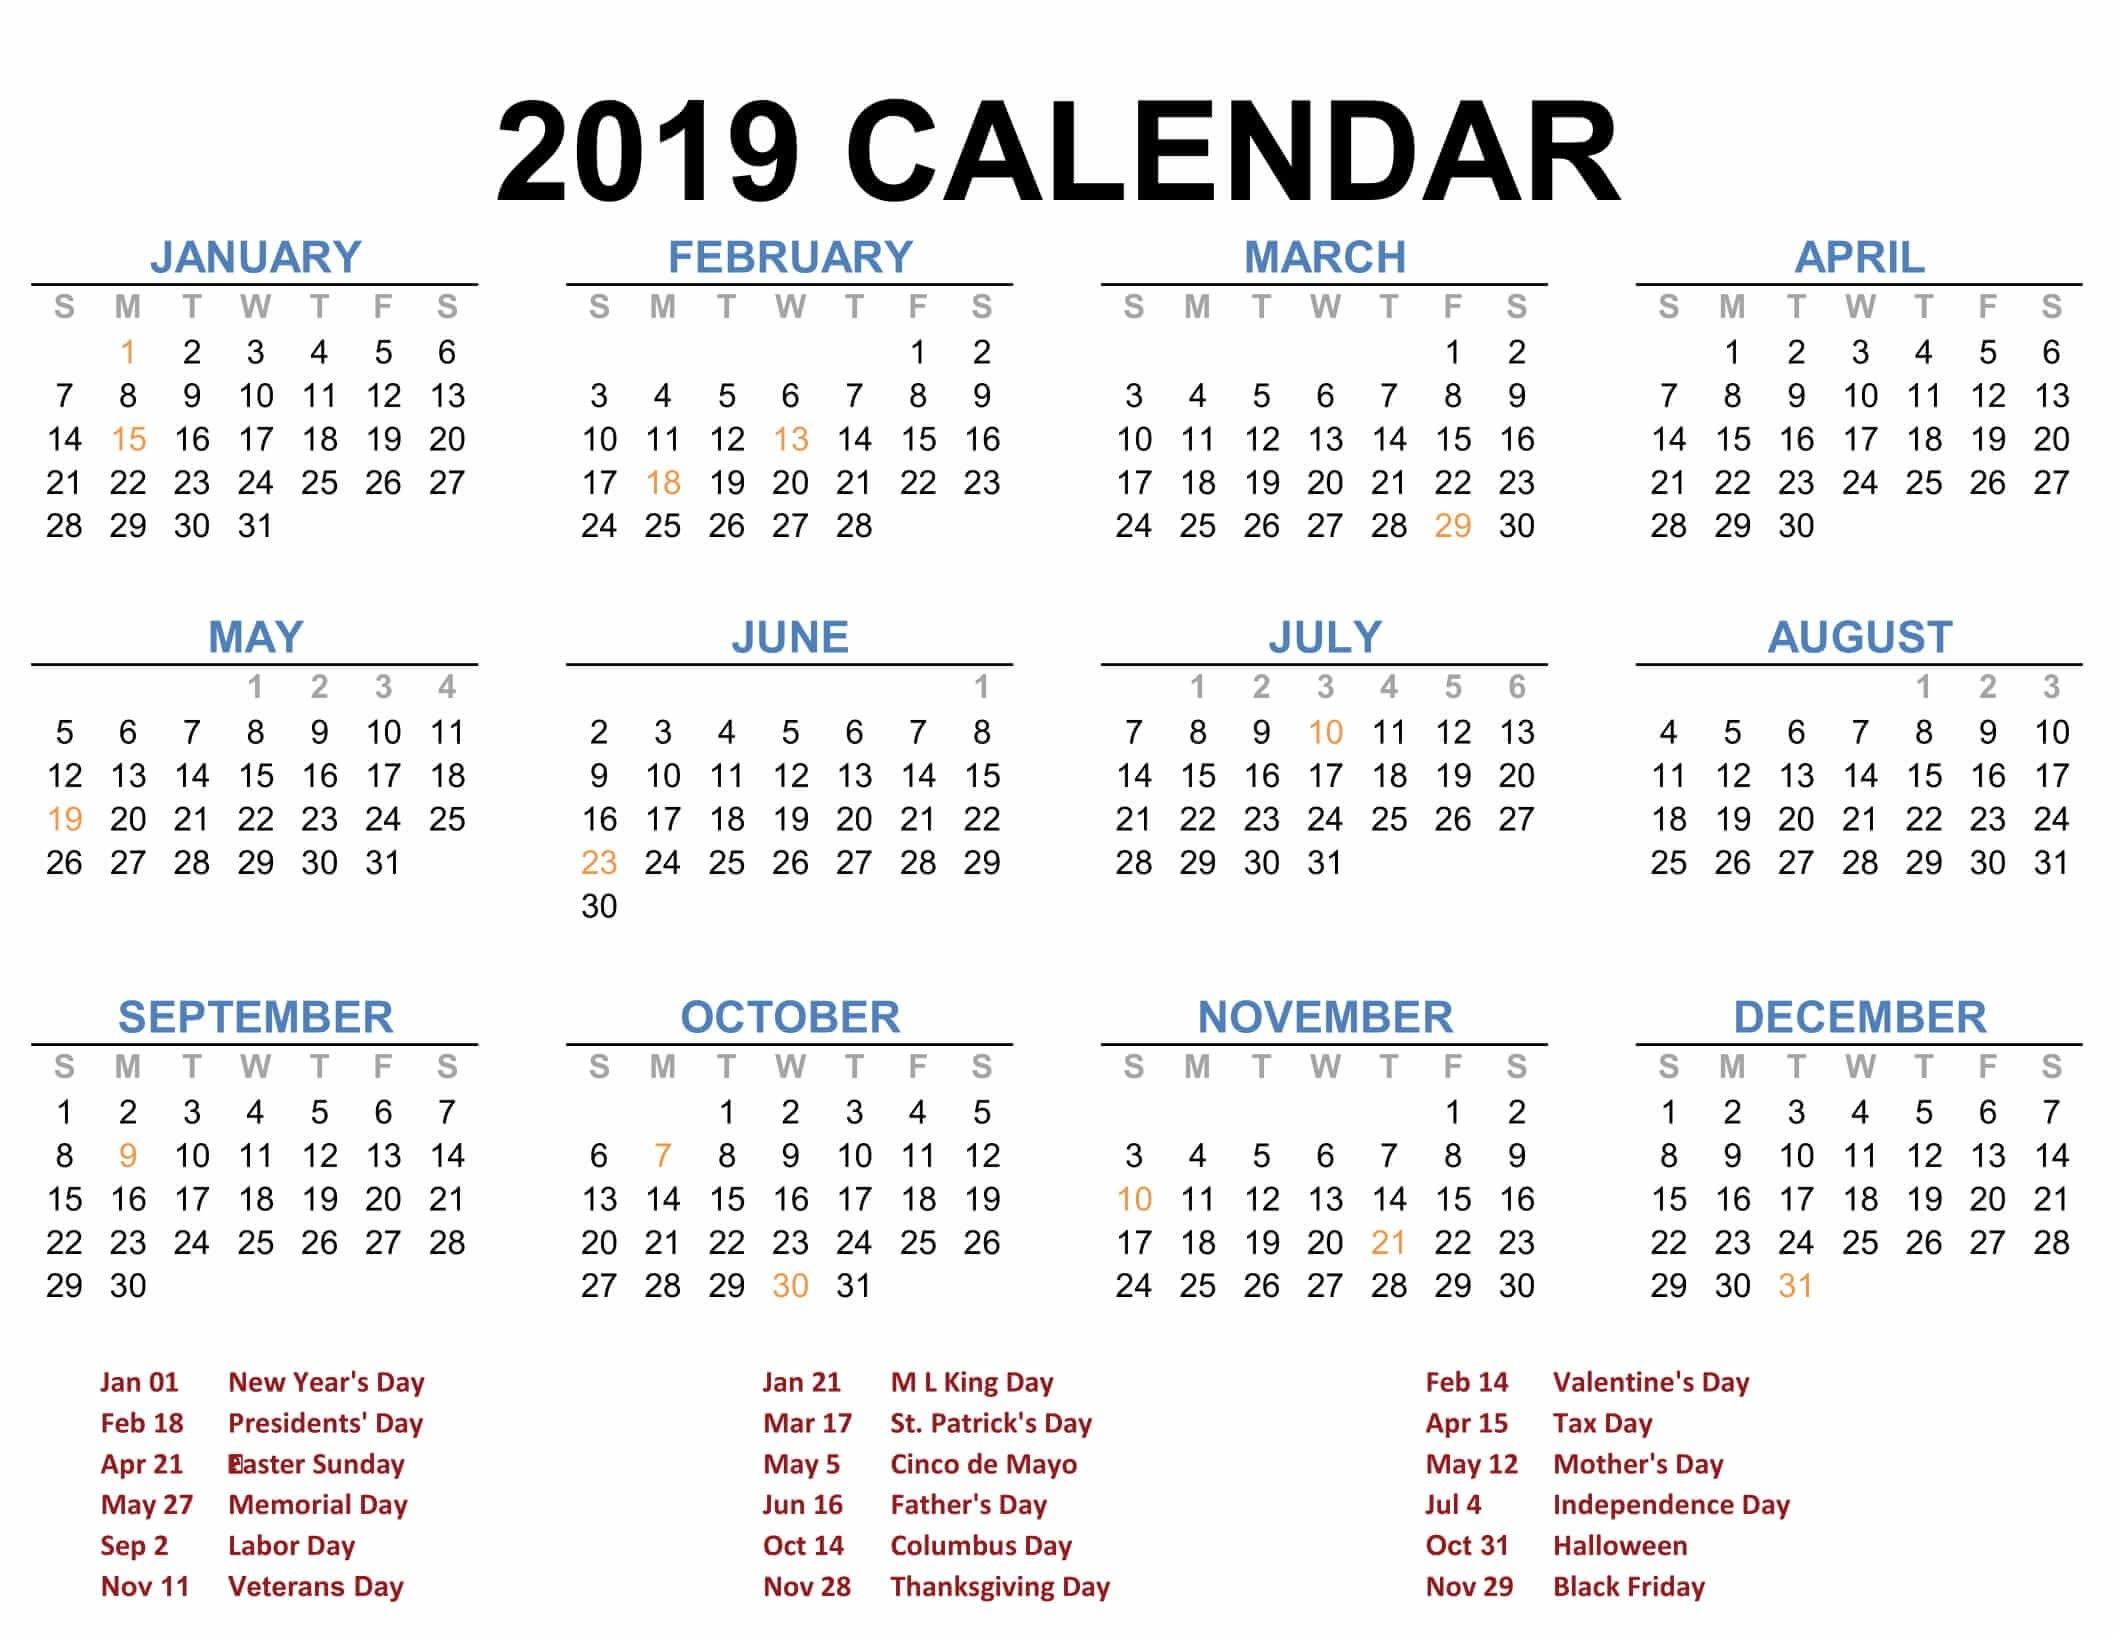 Printable Blank 2019 Calendar Templates - Calenndar Calendar 2019 Yearly Template